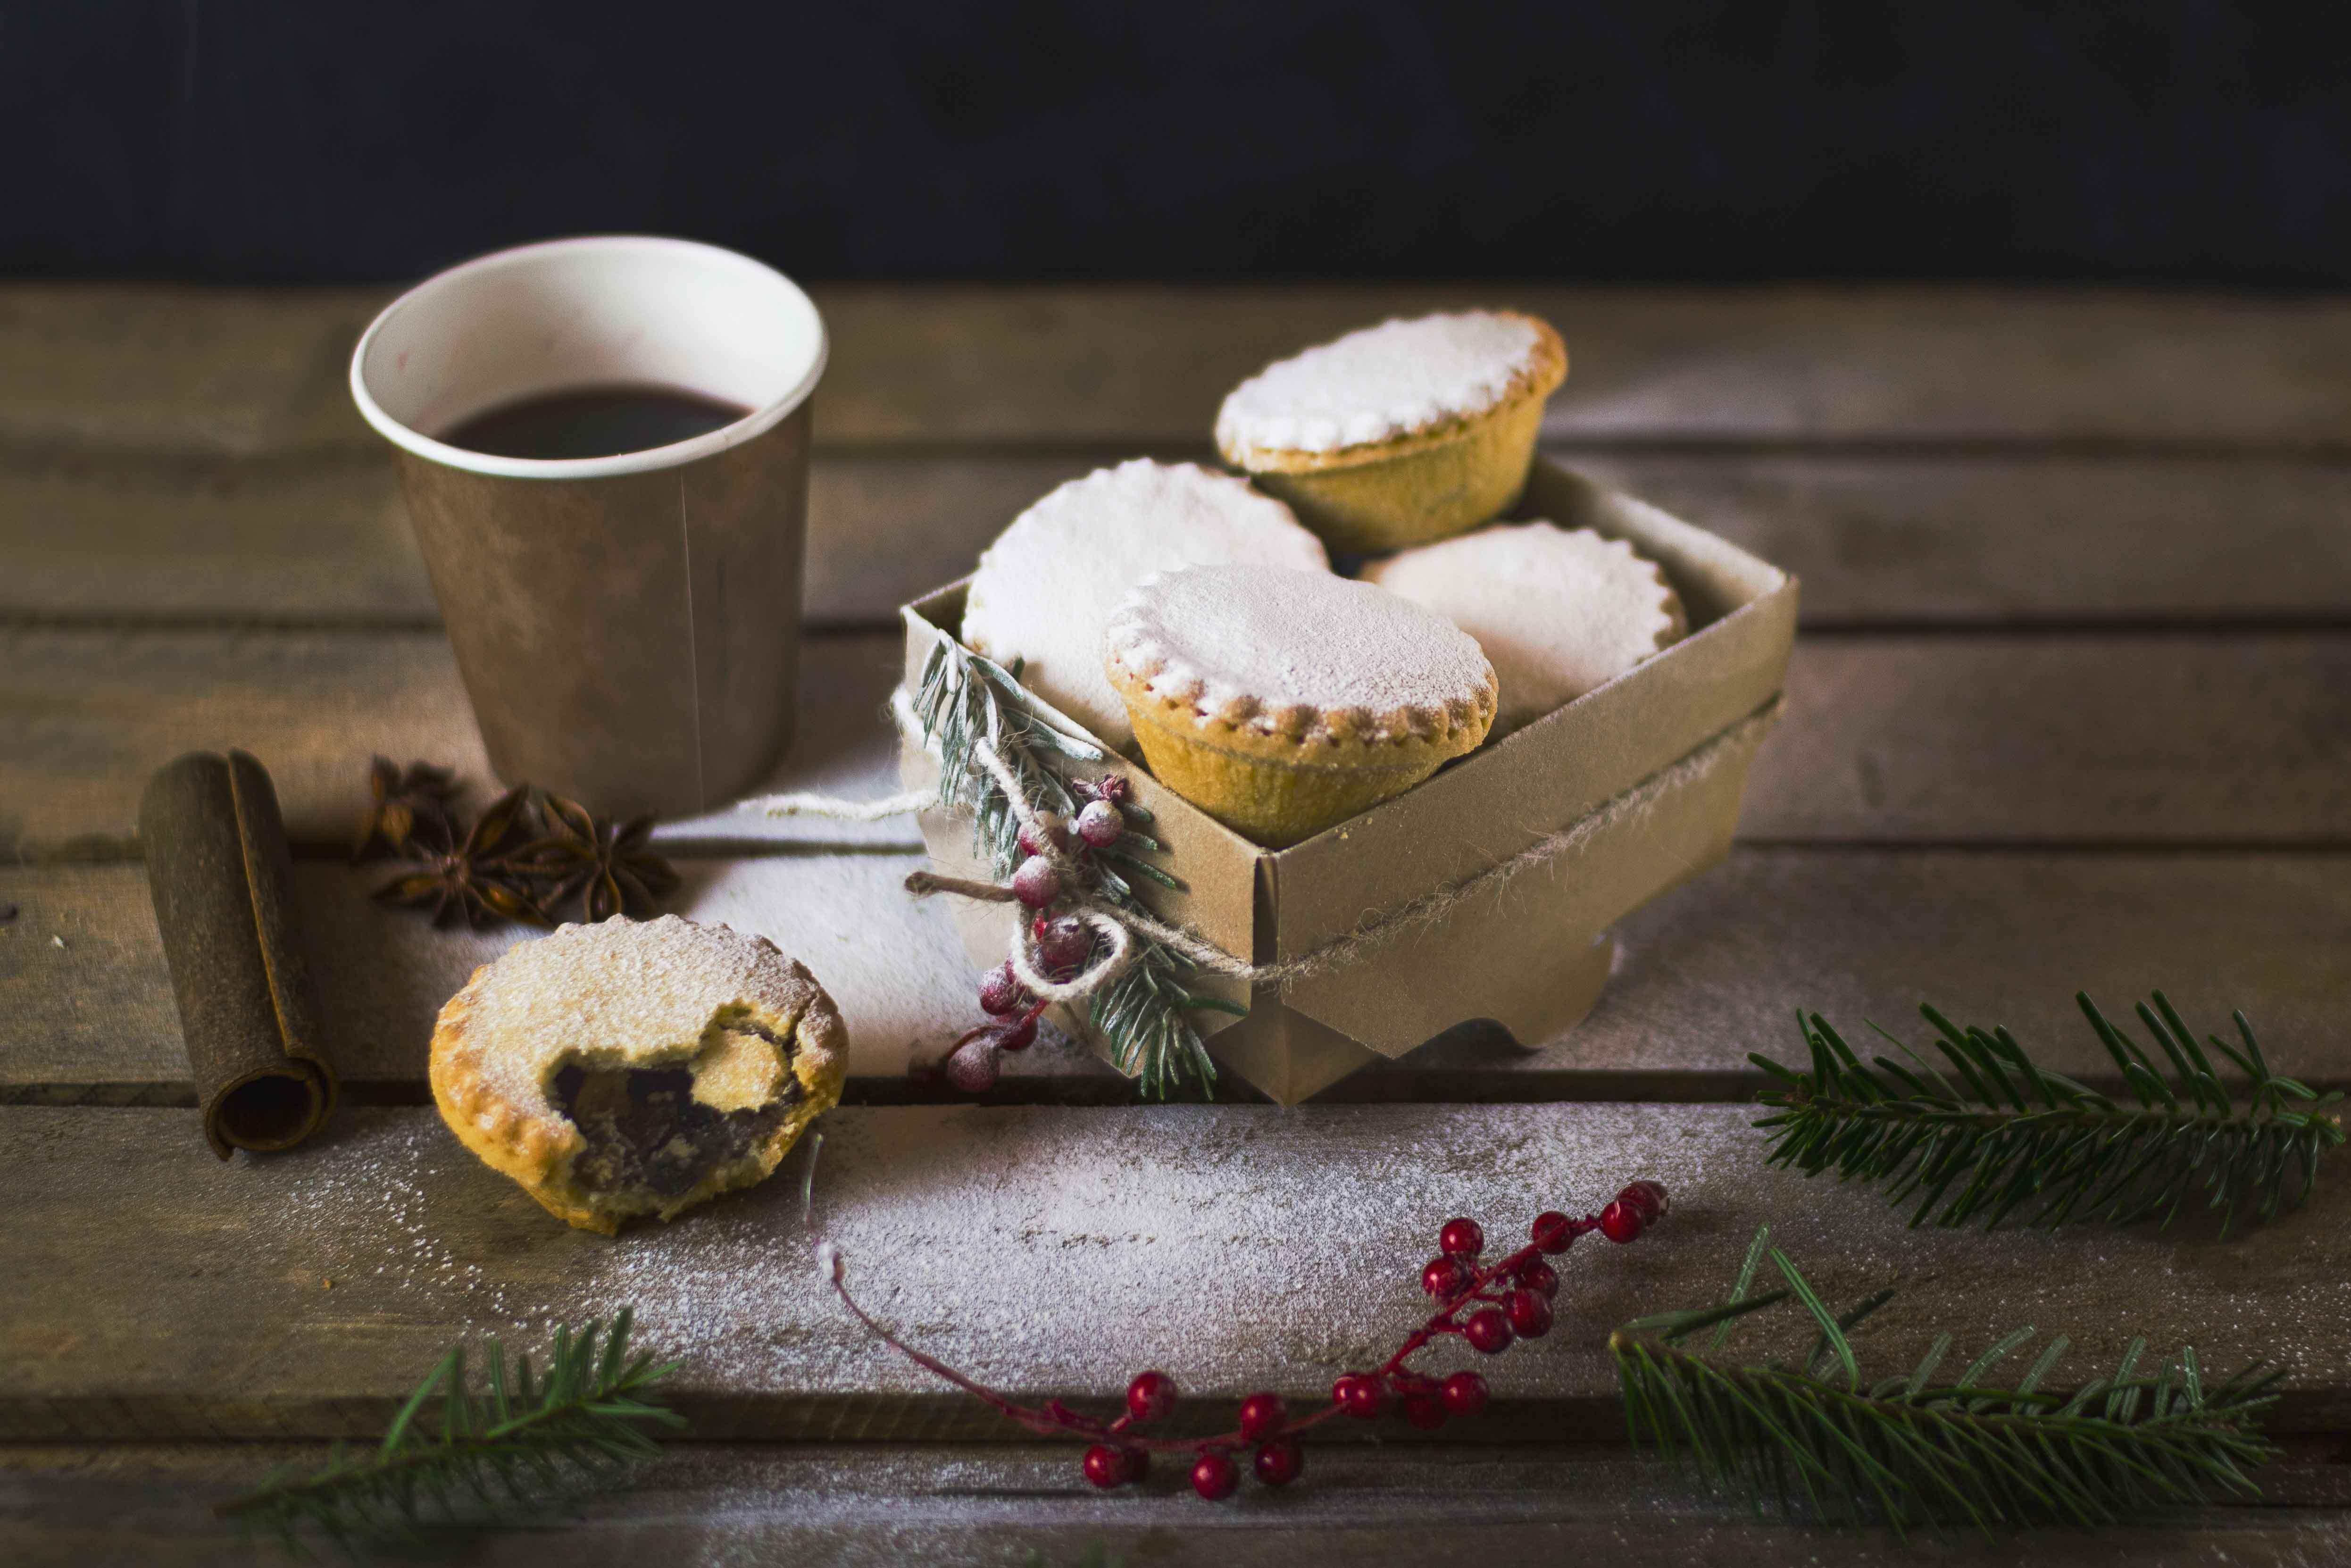 Envases biodegradables para un catering eco-friendly